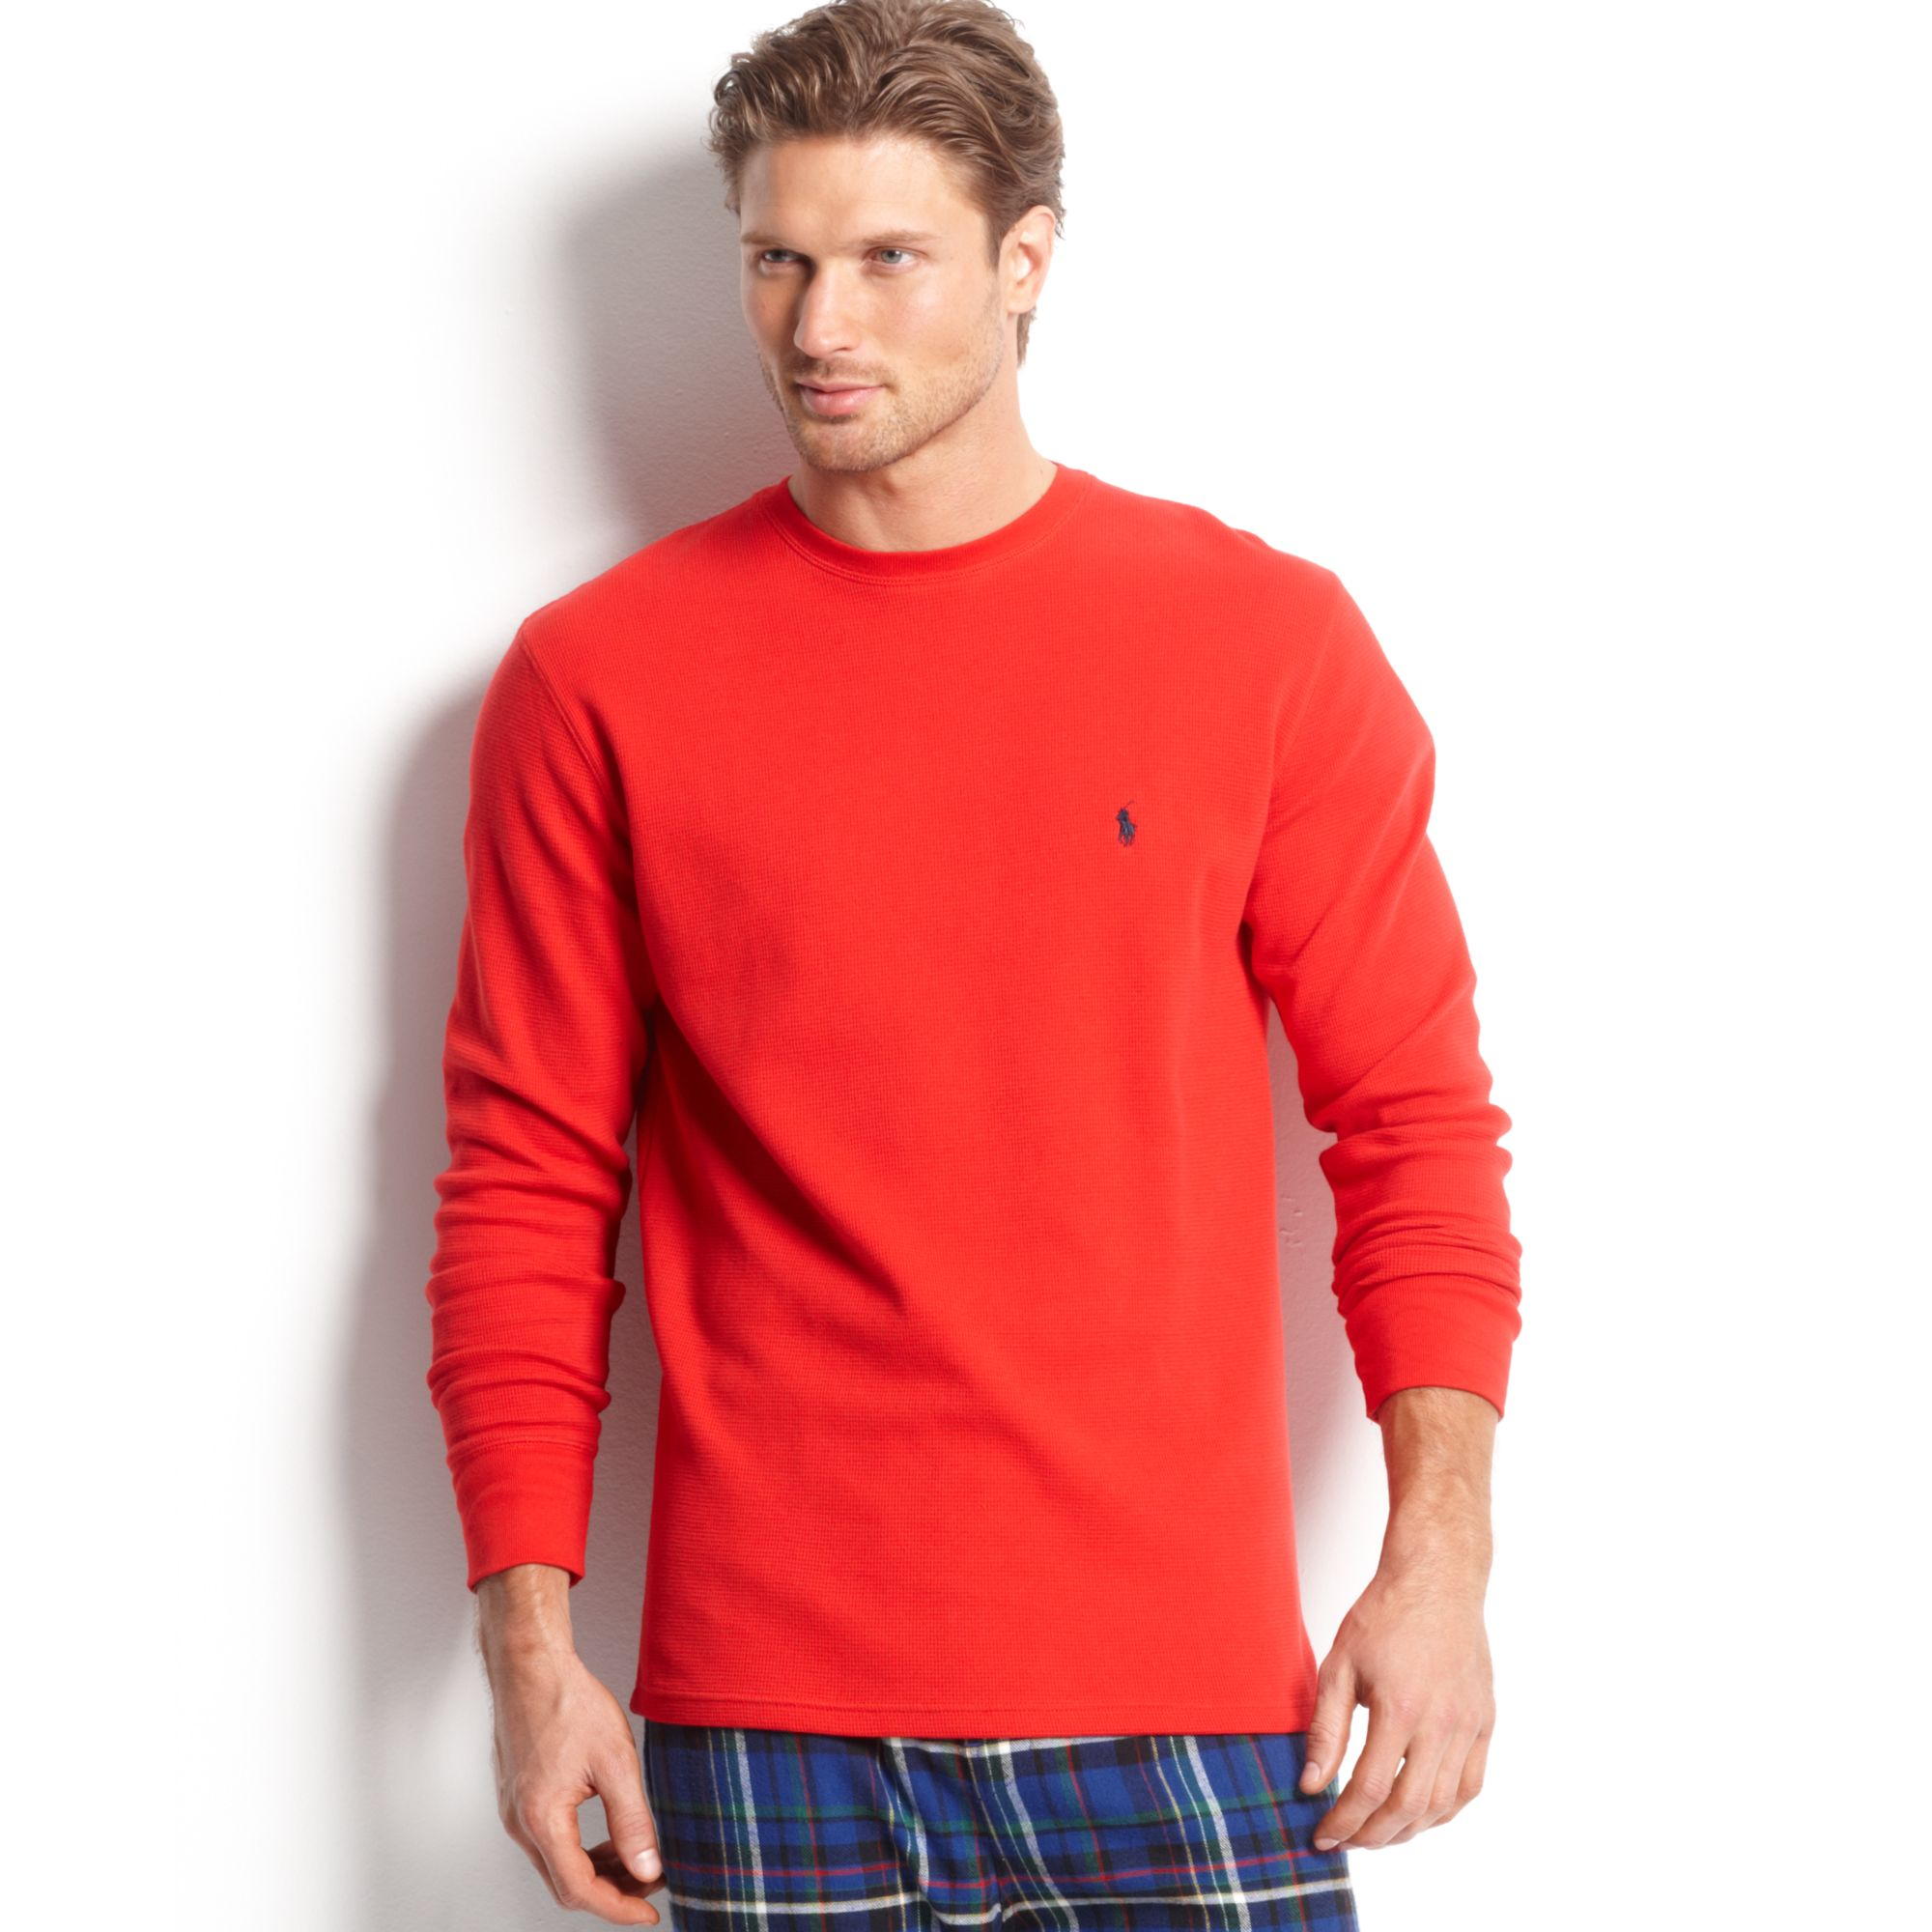 For Red Lauren Thermal T Waffleknit Shirt Crew Men Neck Ralph Long Sleeve iuOPkXZ